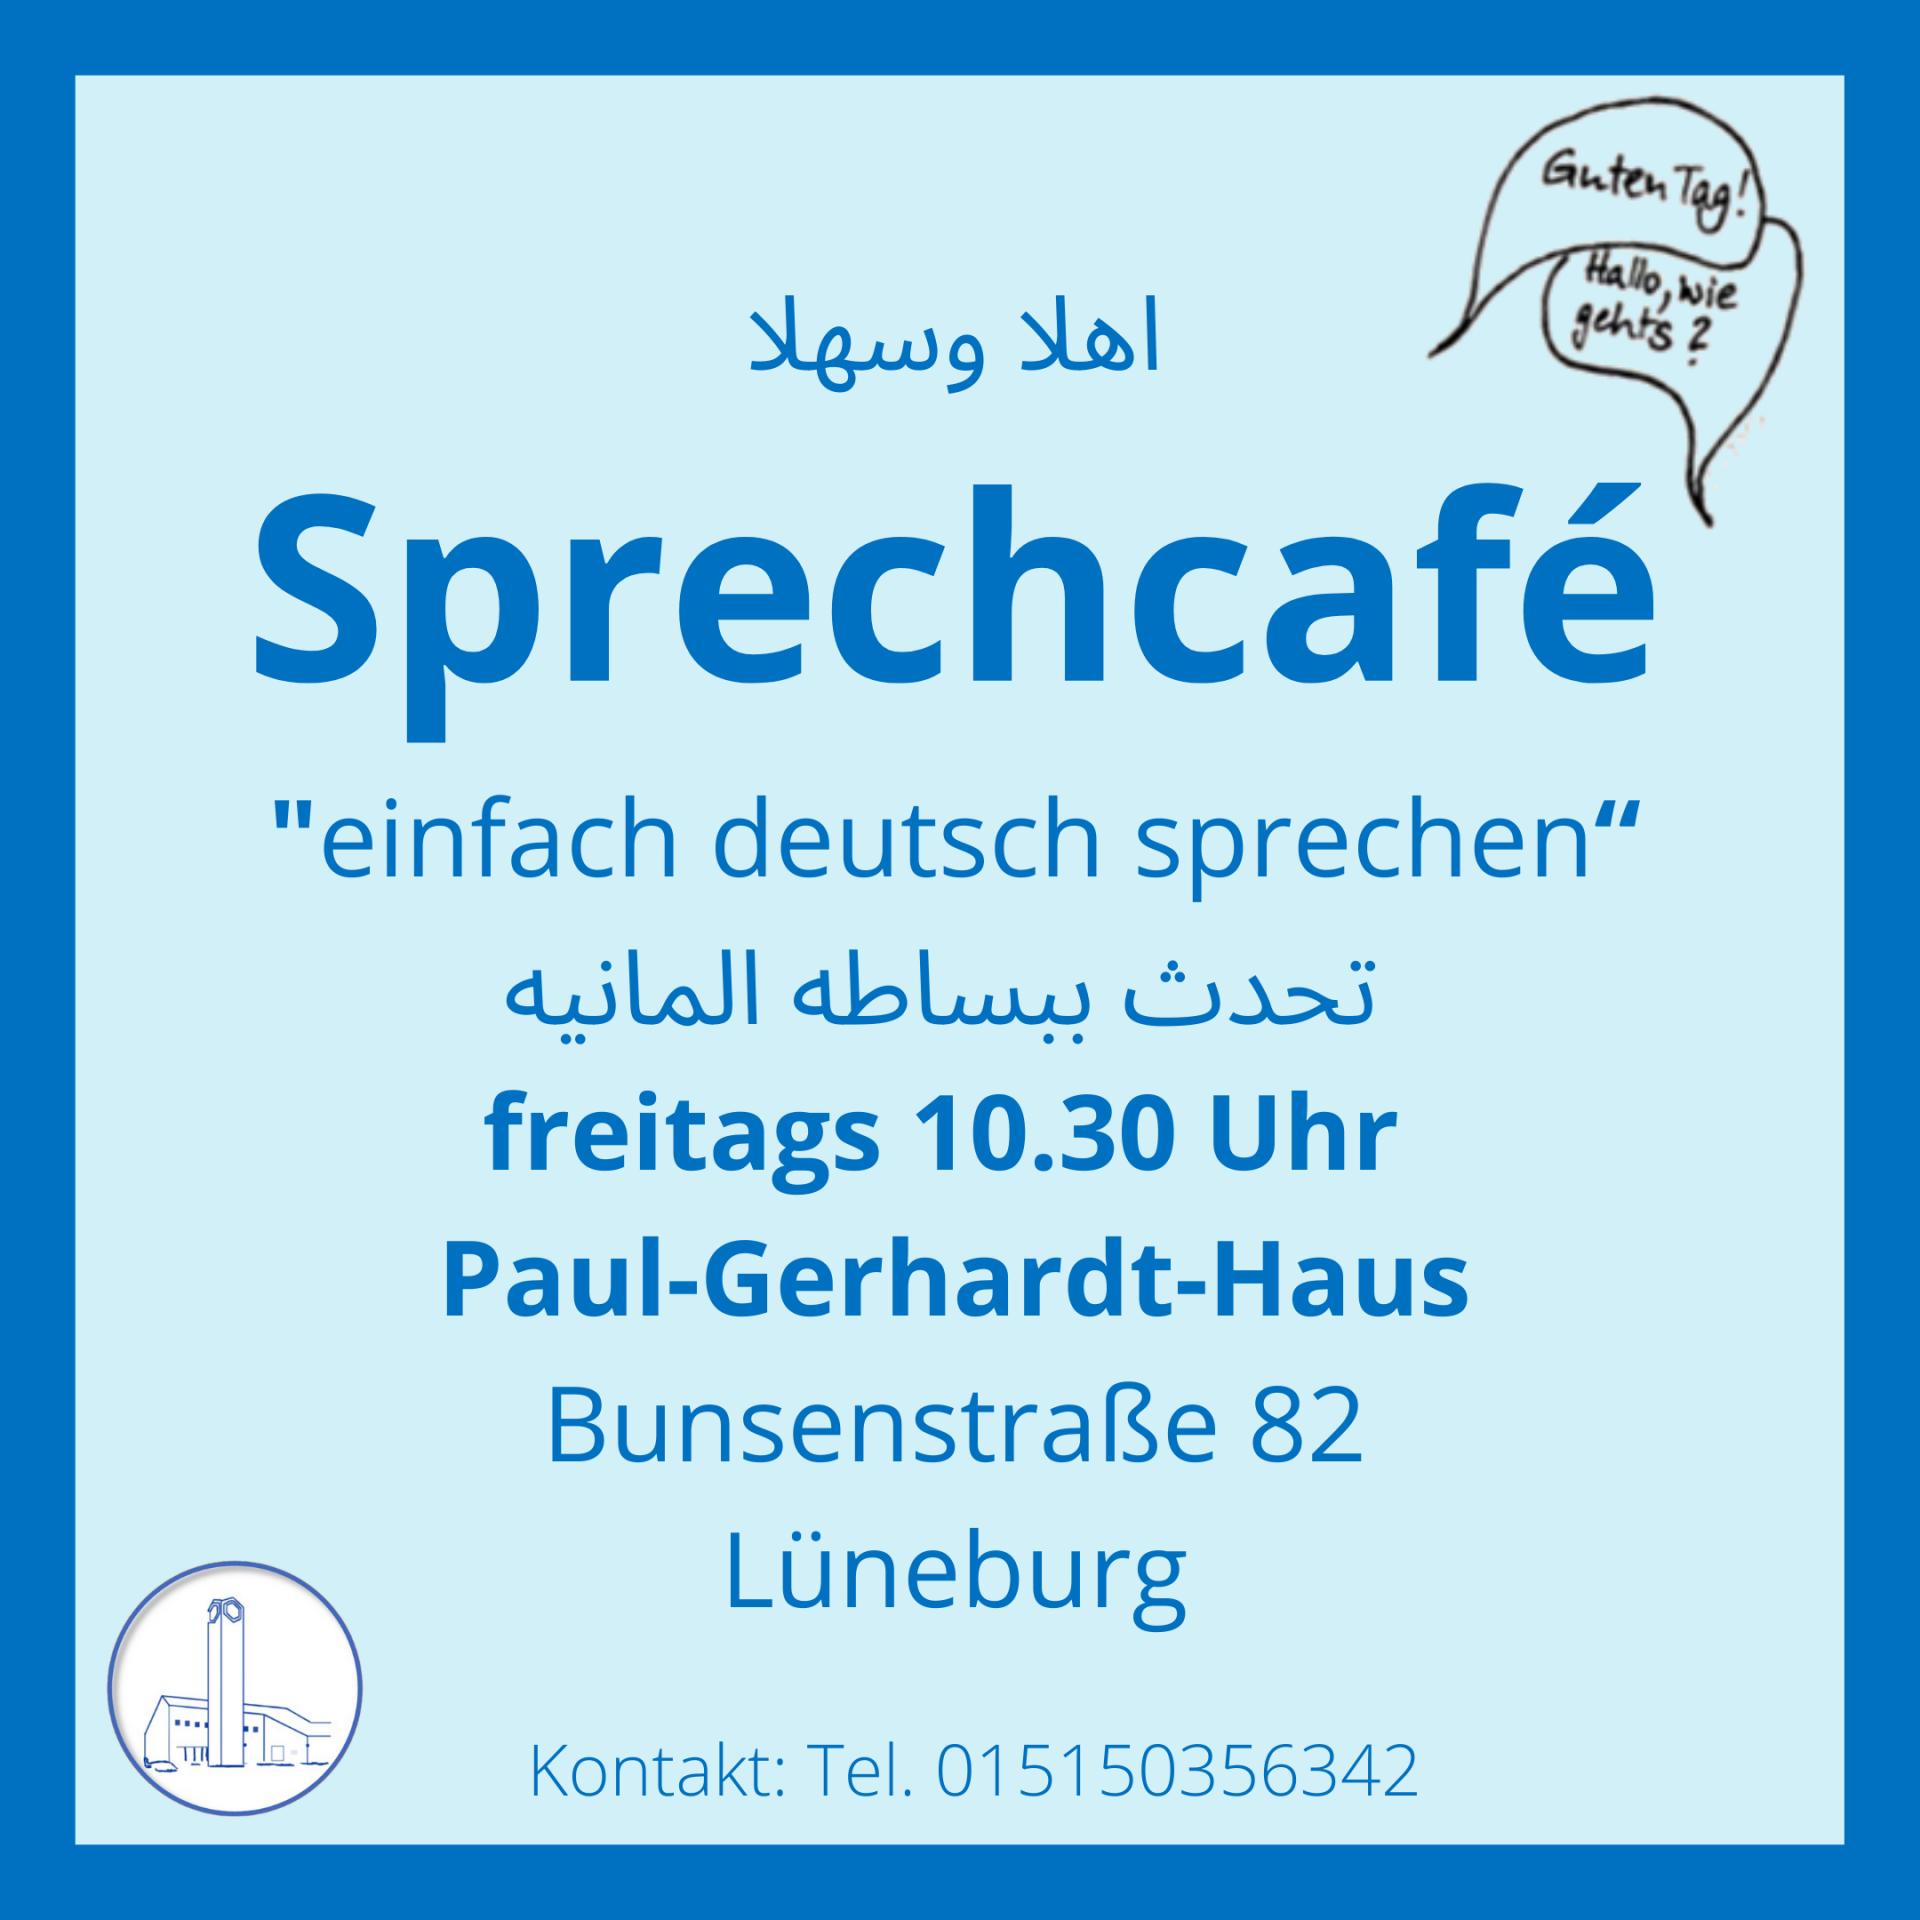 "اهلا وسهلا Sprechcafé ""einfach deutsch sprechen"" تحدث ببساطه المانيه freitags 10.30 Uhr Paul-Gerhardt-Haus Bunsenstraße 82 Lüneburg (2)"